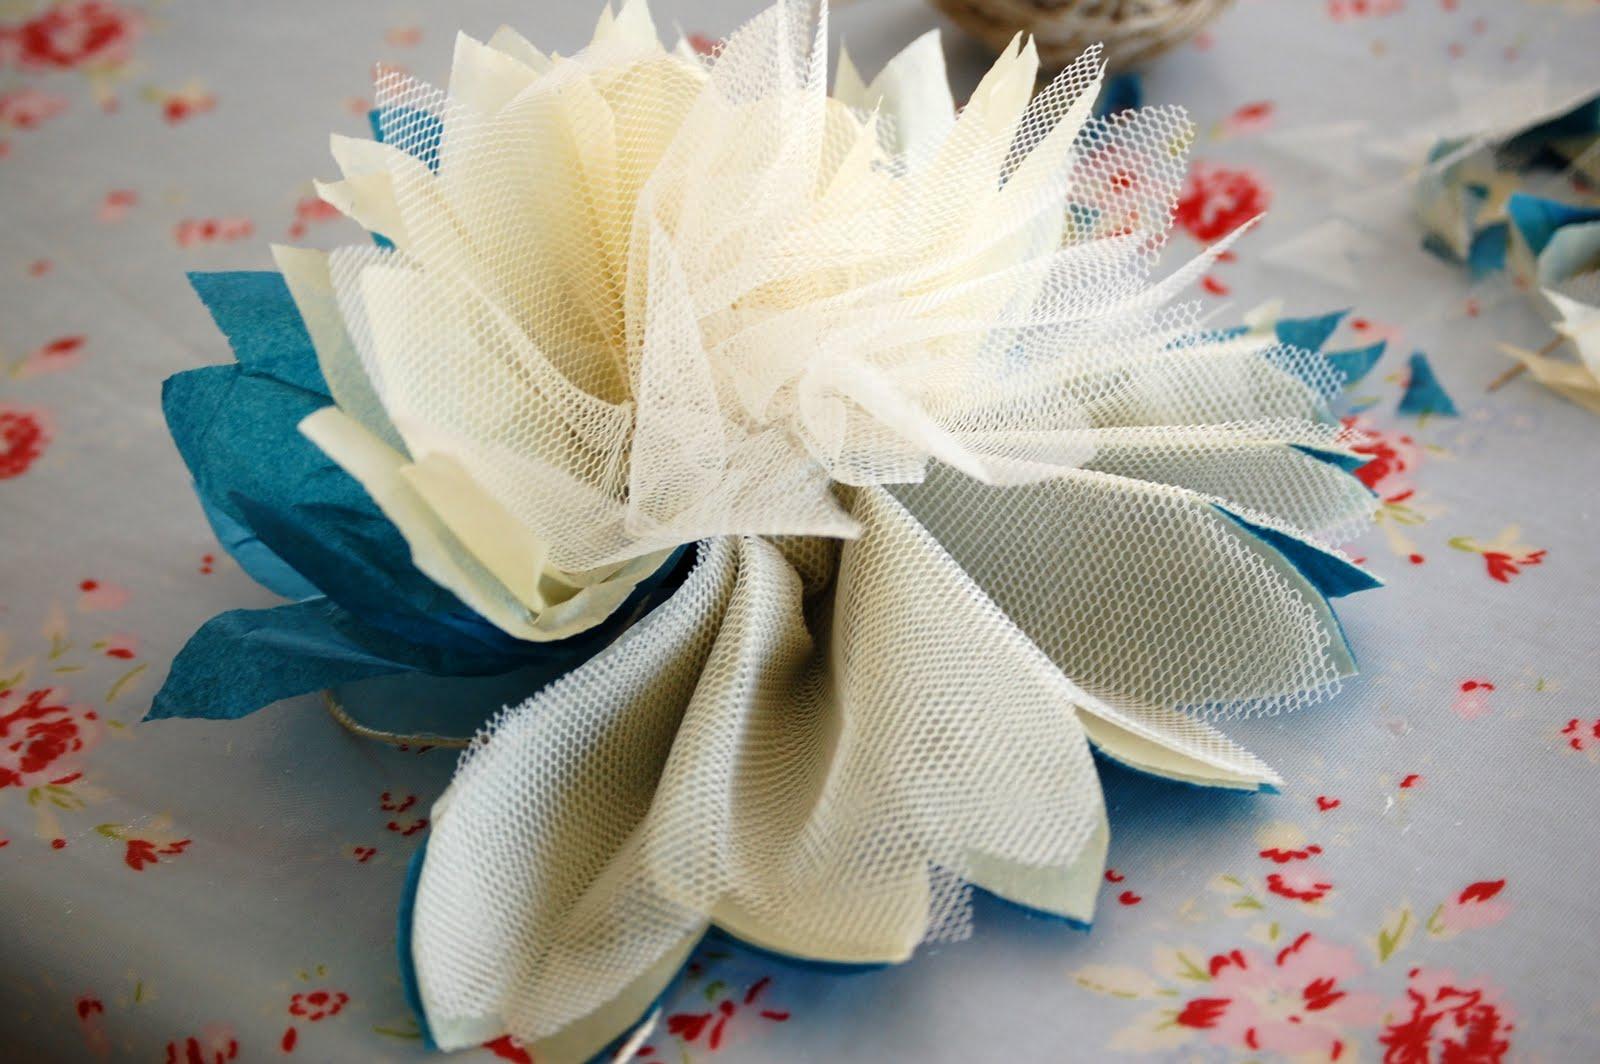 como fazer pompom papel de seda tule decoracao festa aniversario batizado casamento cha de bebe (6)